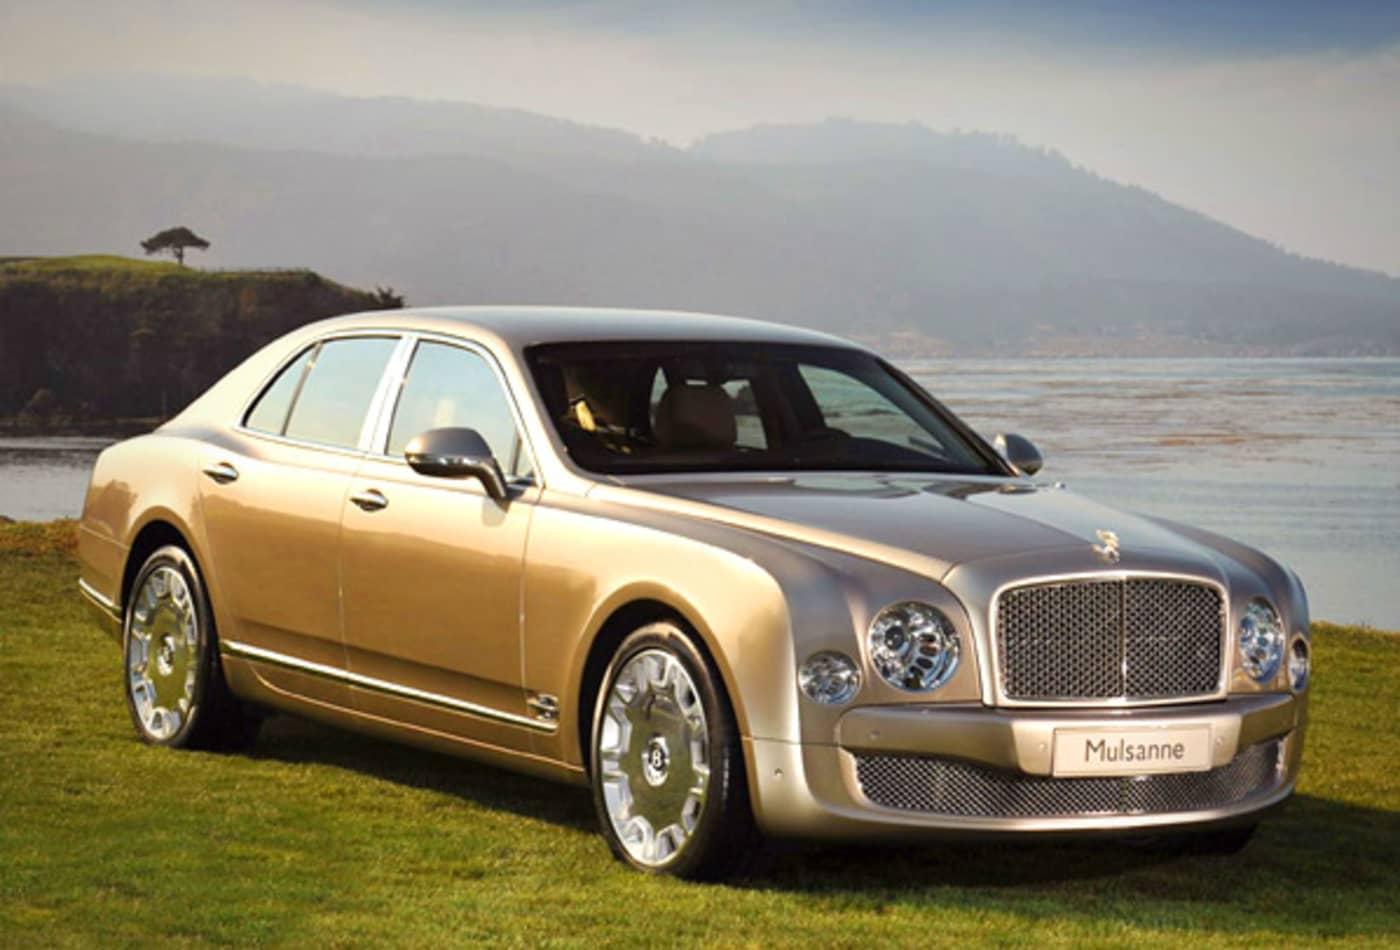 SS_Biggest_Gas_Guzzlers_Bentley_Mulsanne.jpg